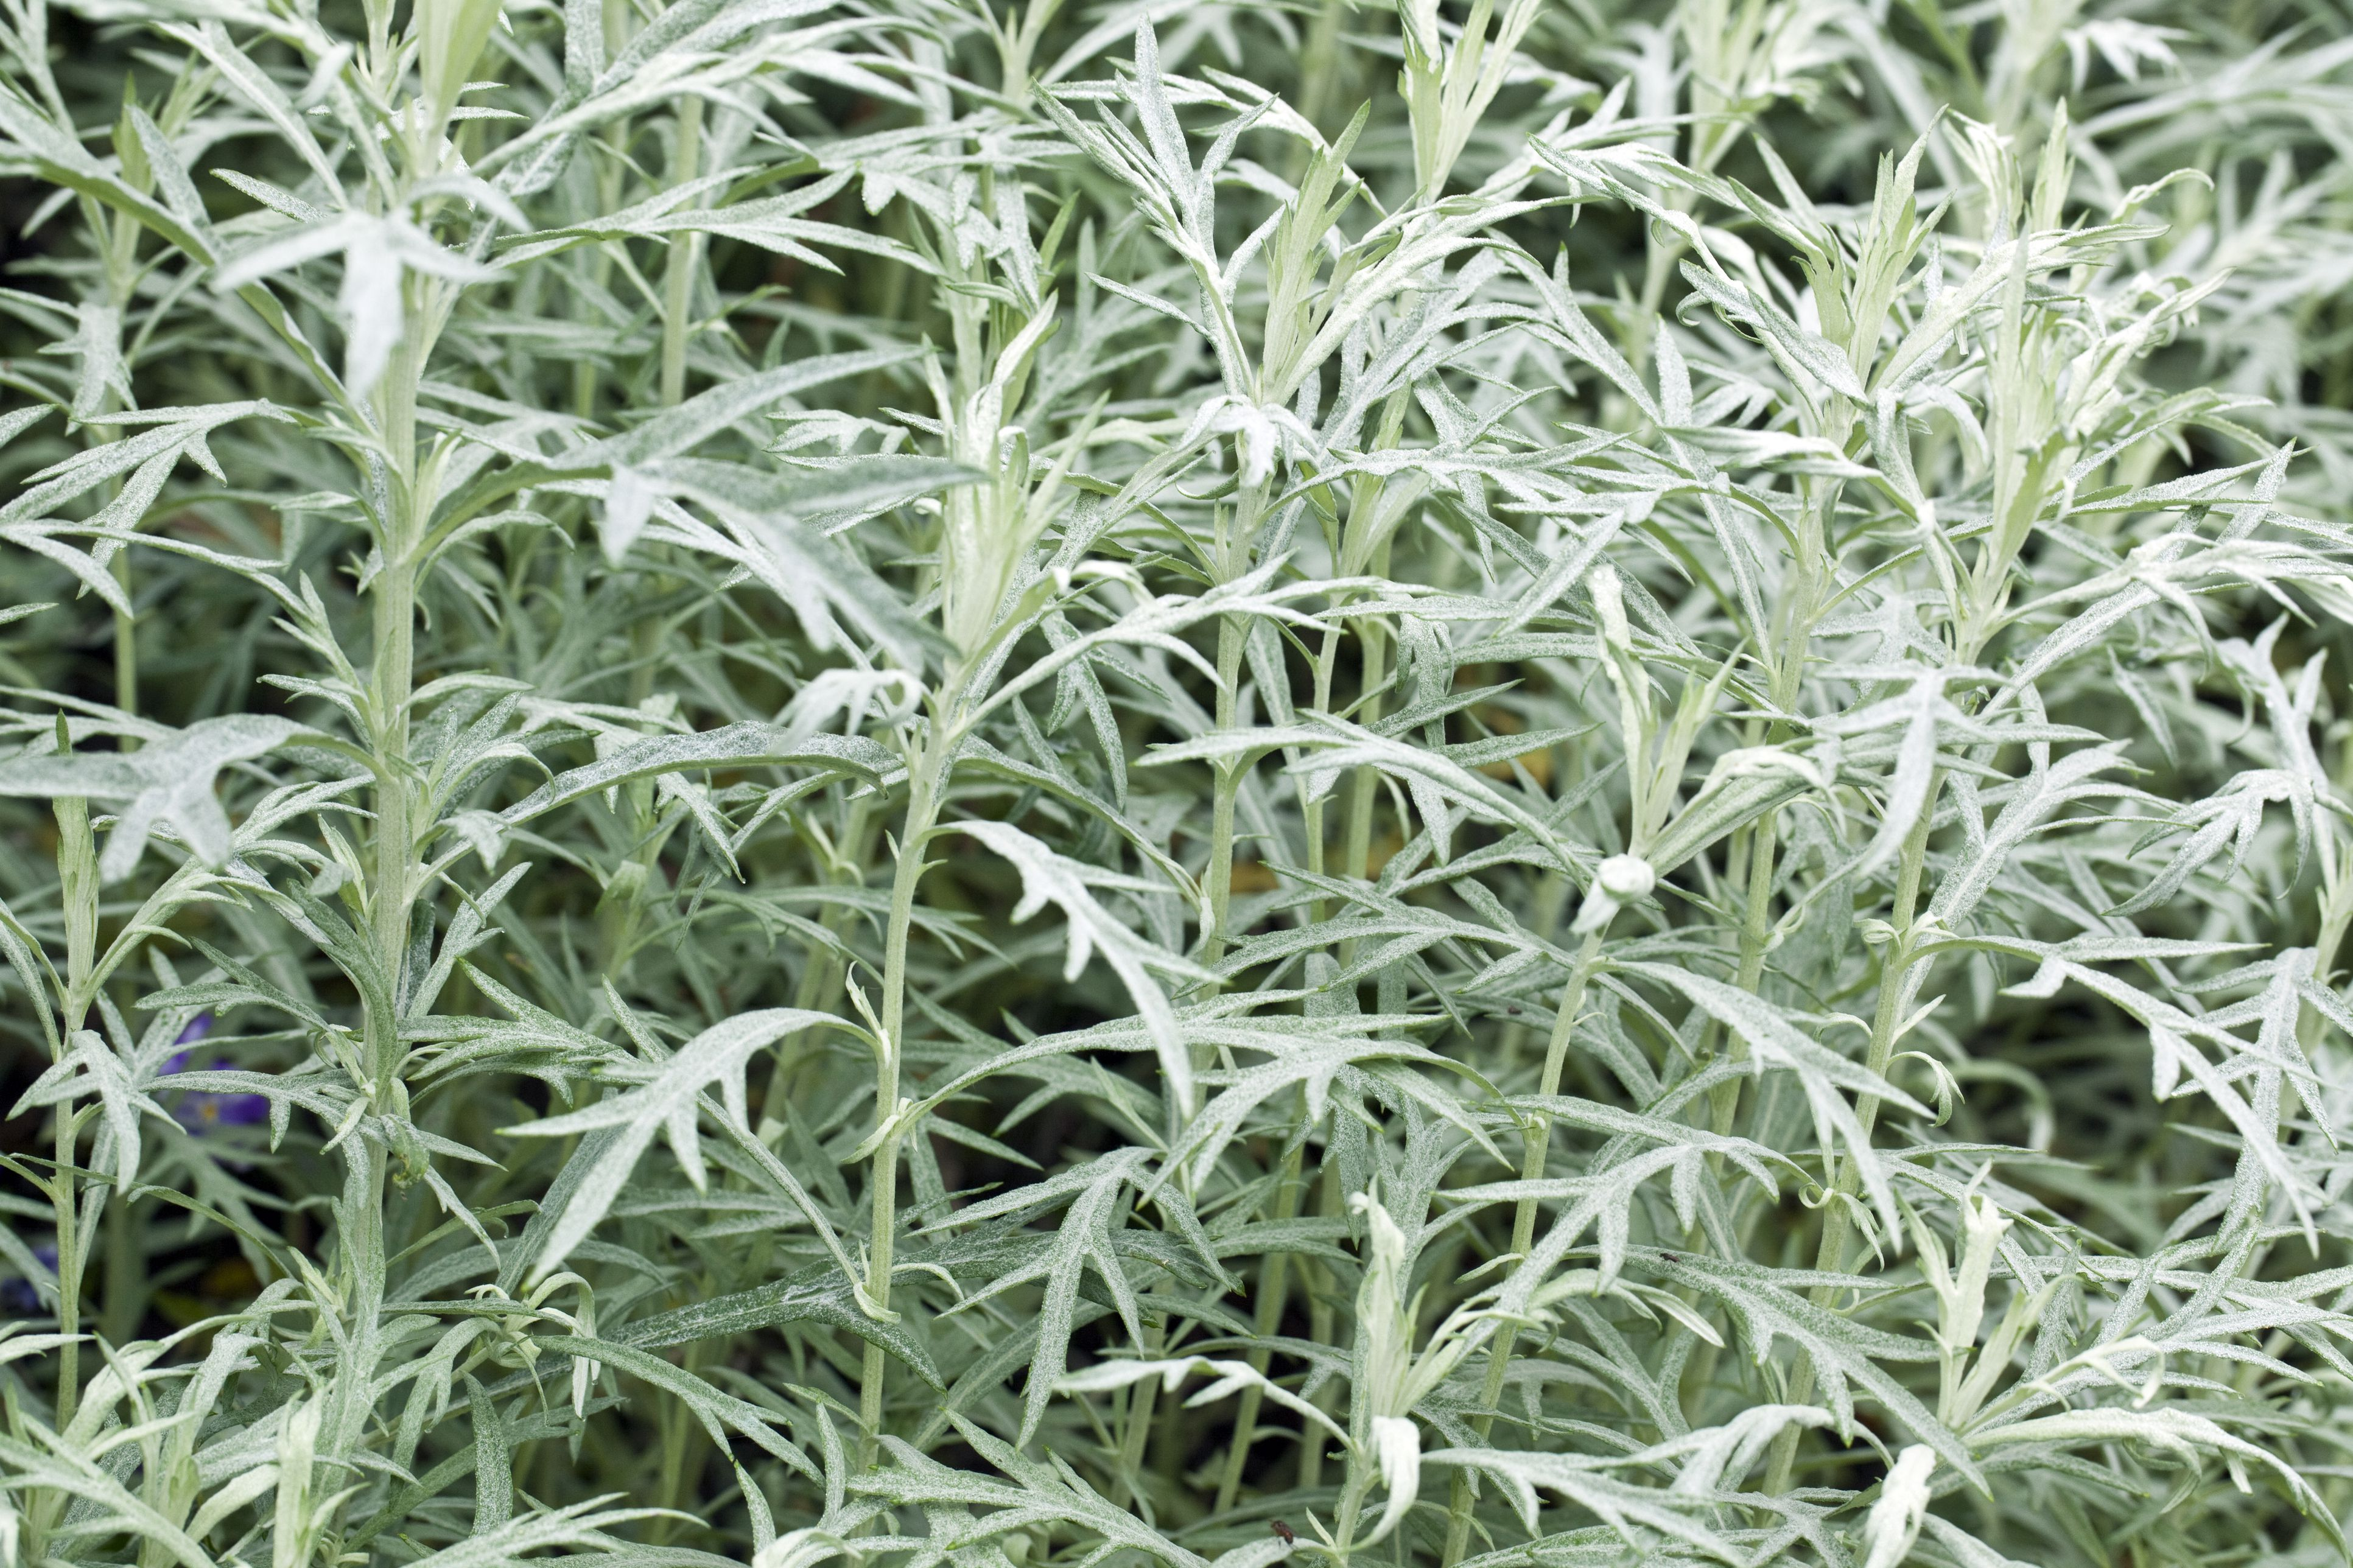 Silver Green Foliage of Mugwort (Artemesia)